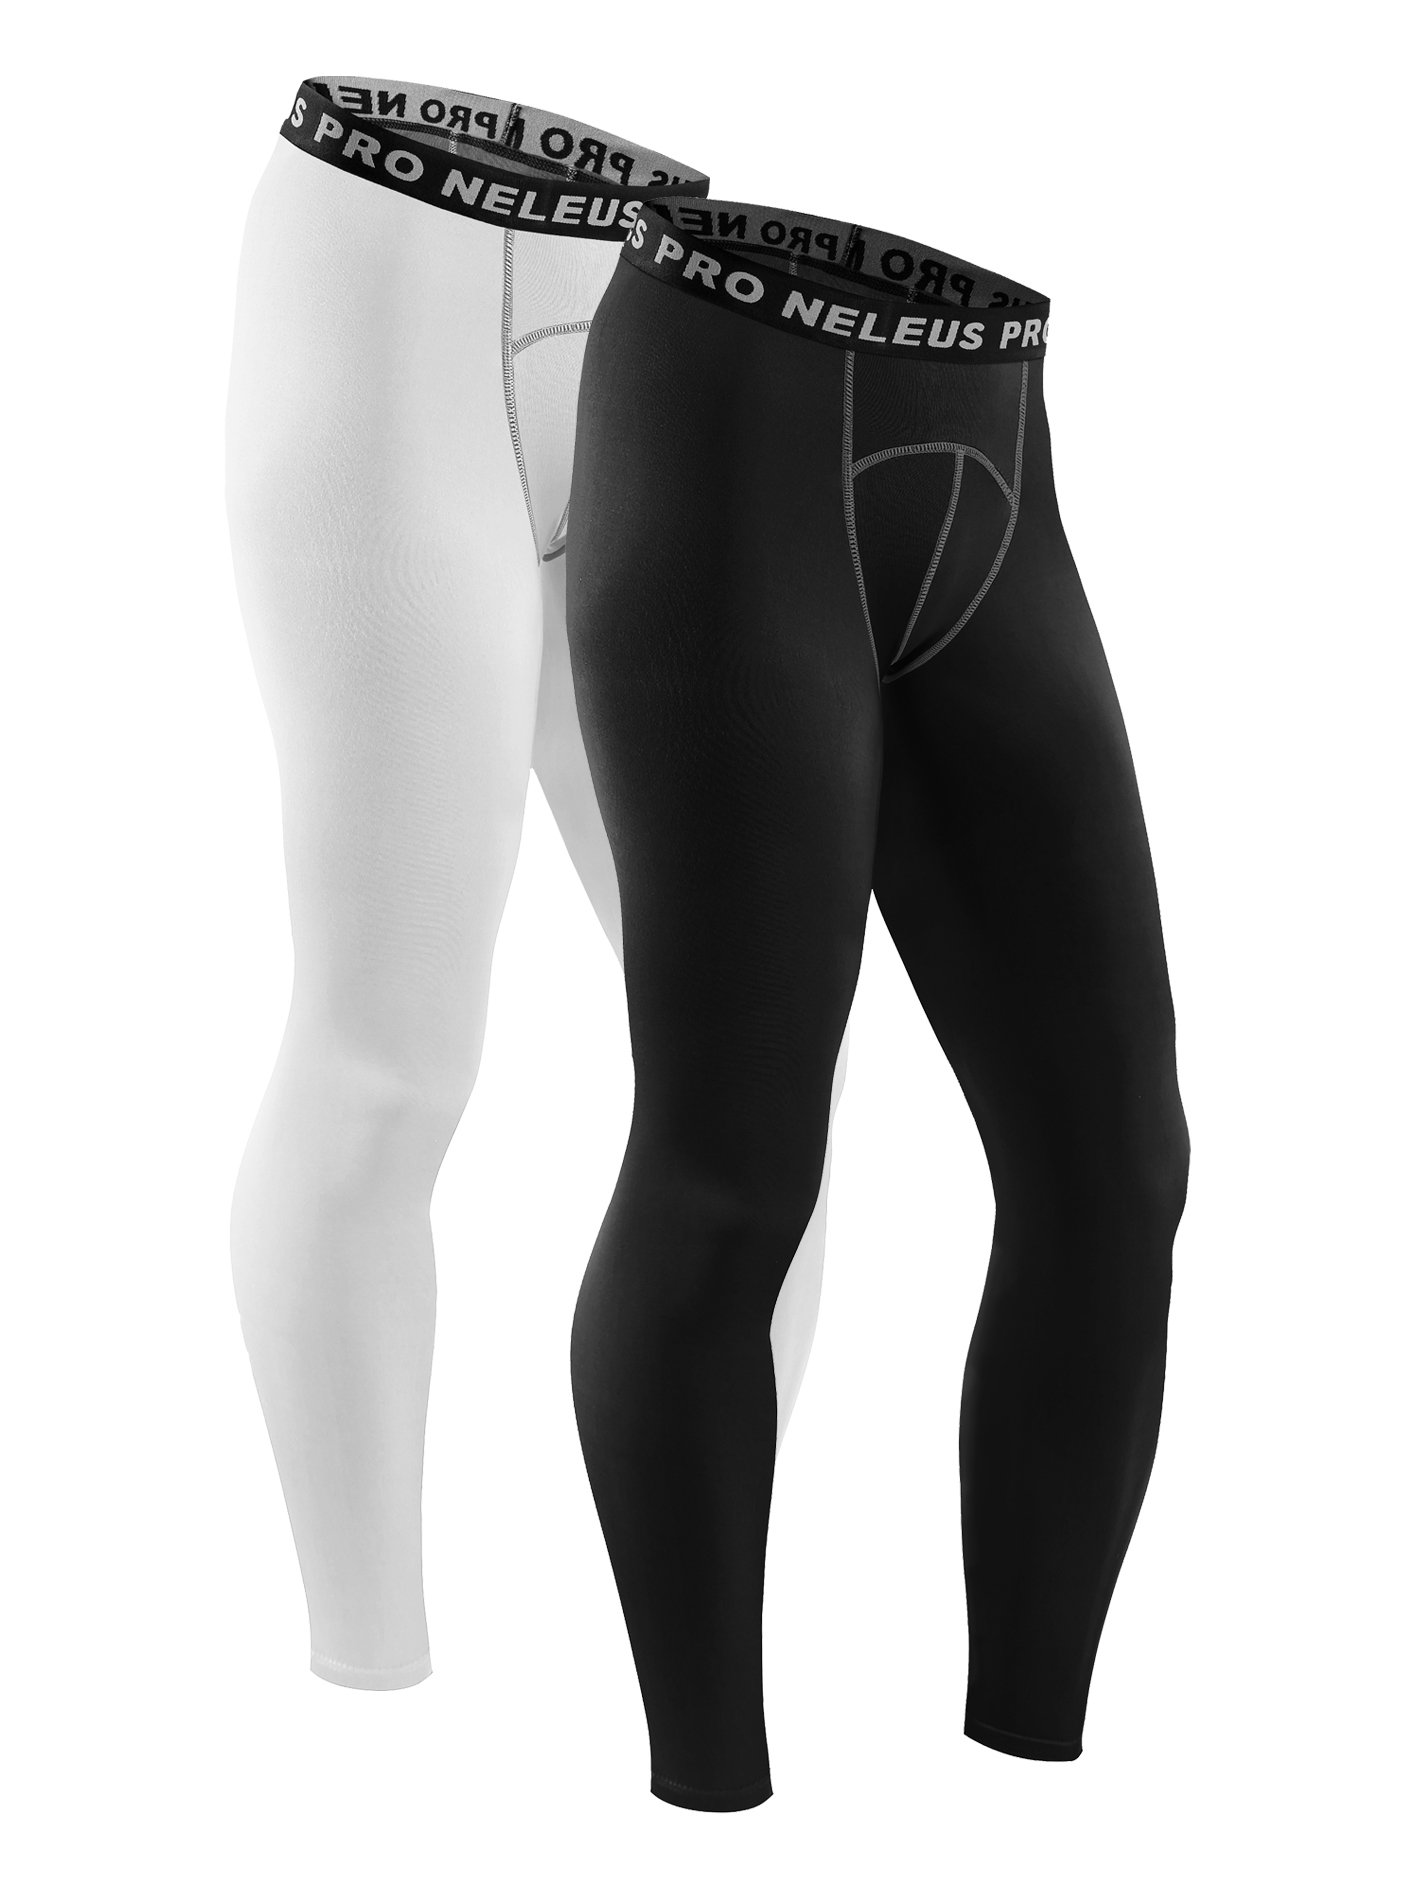 Neleus Men's 2 Pack Compression Pants Running Tights Sport Leggings,6026,White,Black,S,EUR M